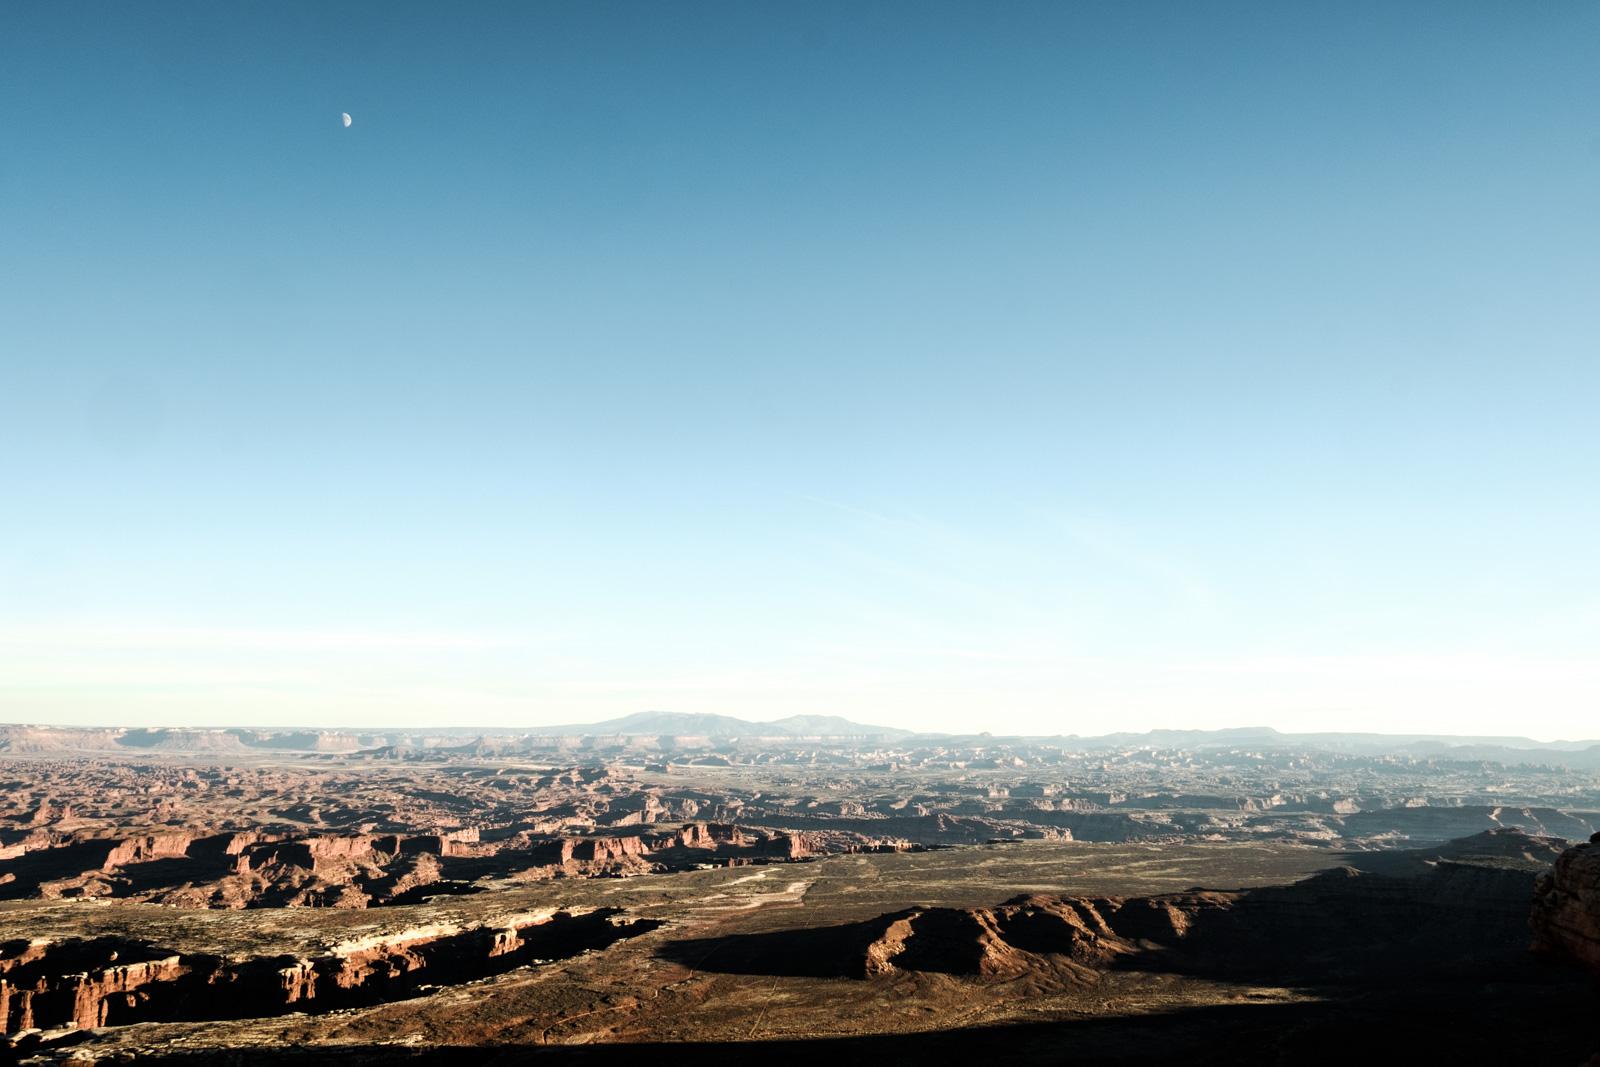 Moon over lunar surface. Canyonlands National Park, Utah